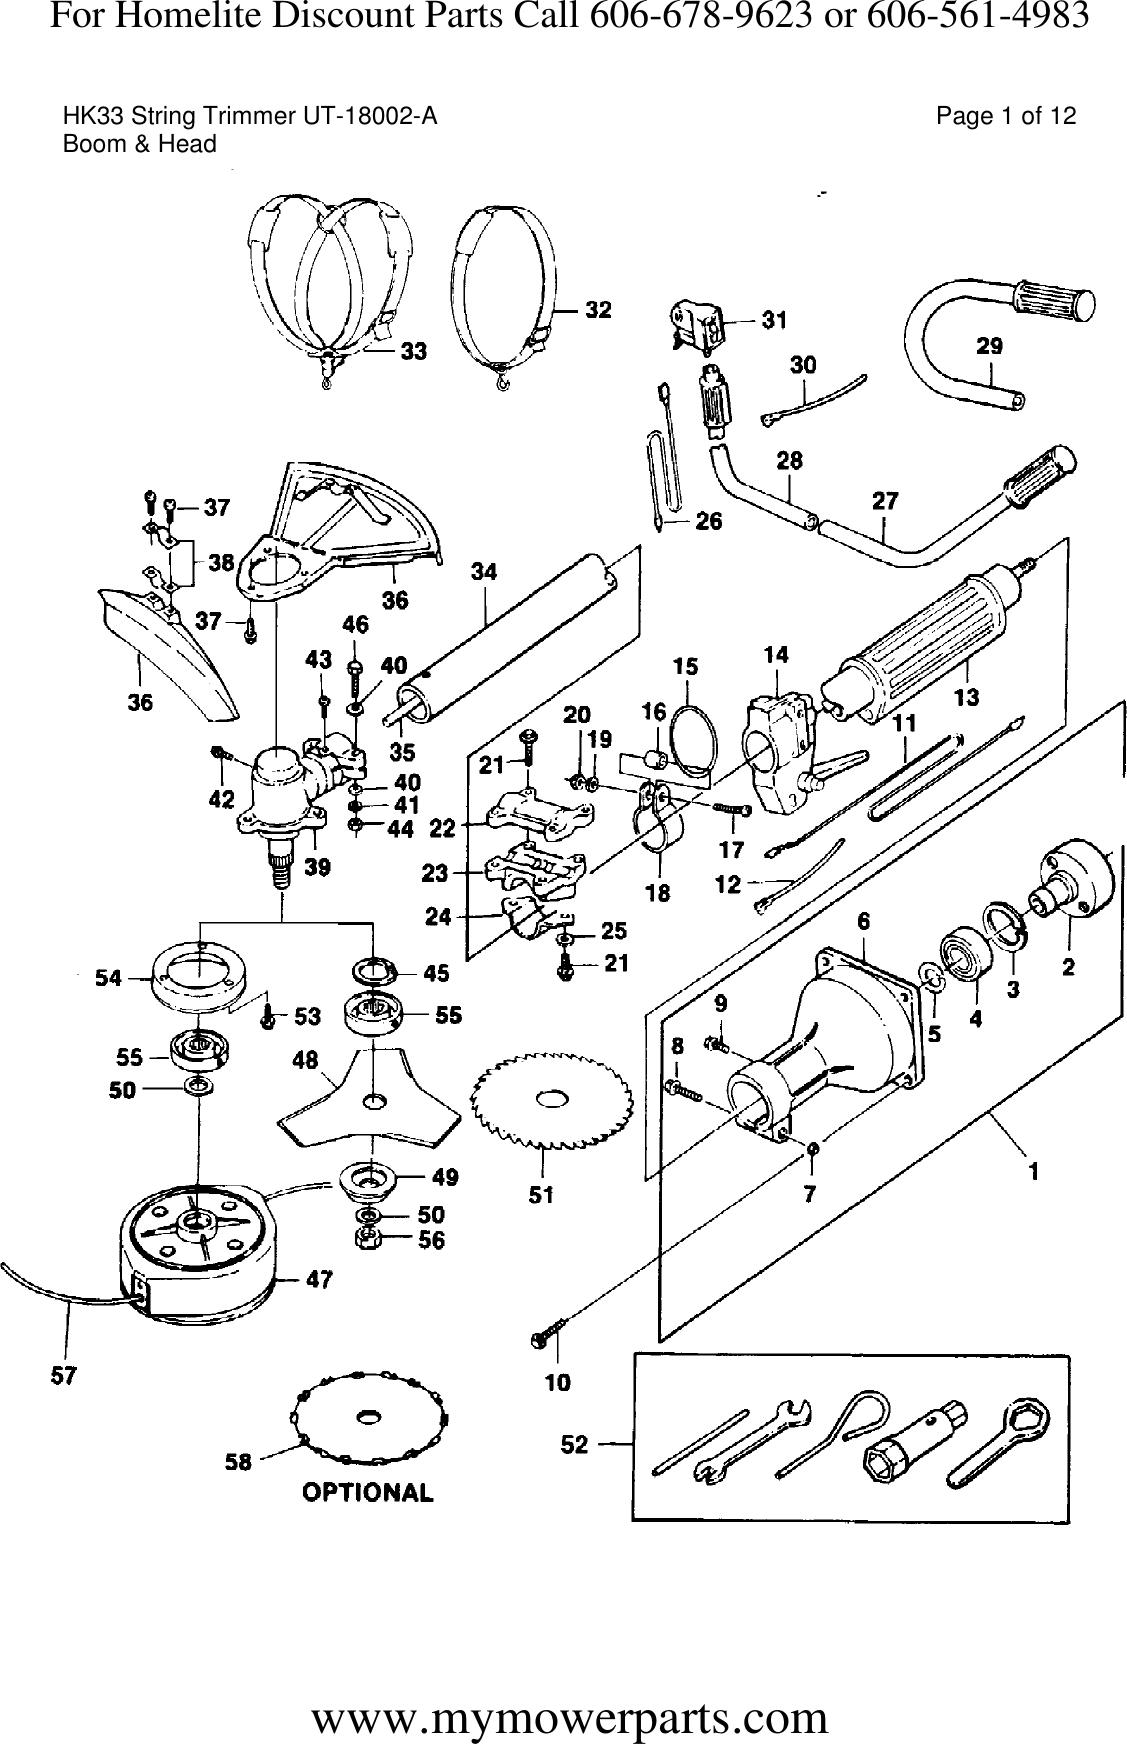 Diagram And/or PartsList !! Homelite String Trimmer Parts